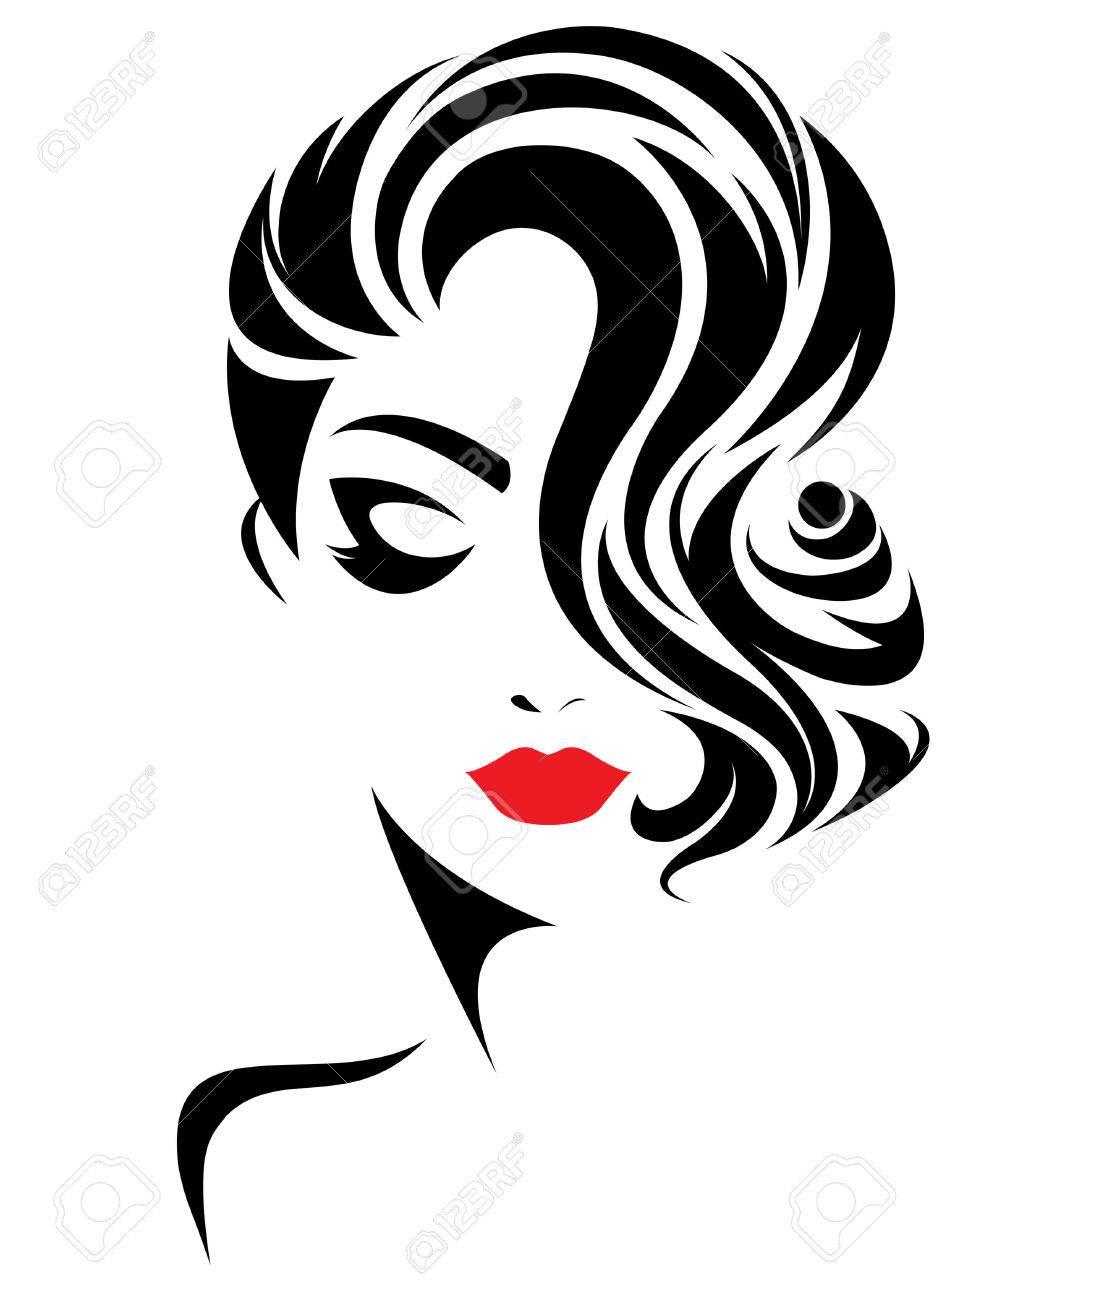 illustration of women short hair style icon, logo women face on white background, vector - 66627298